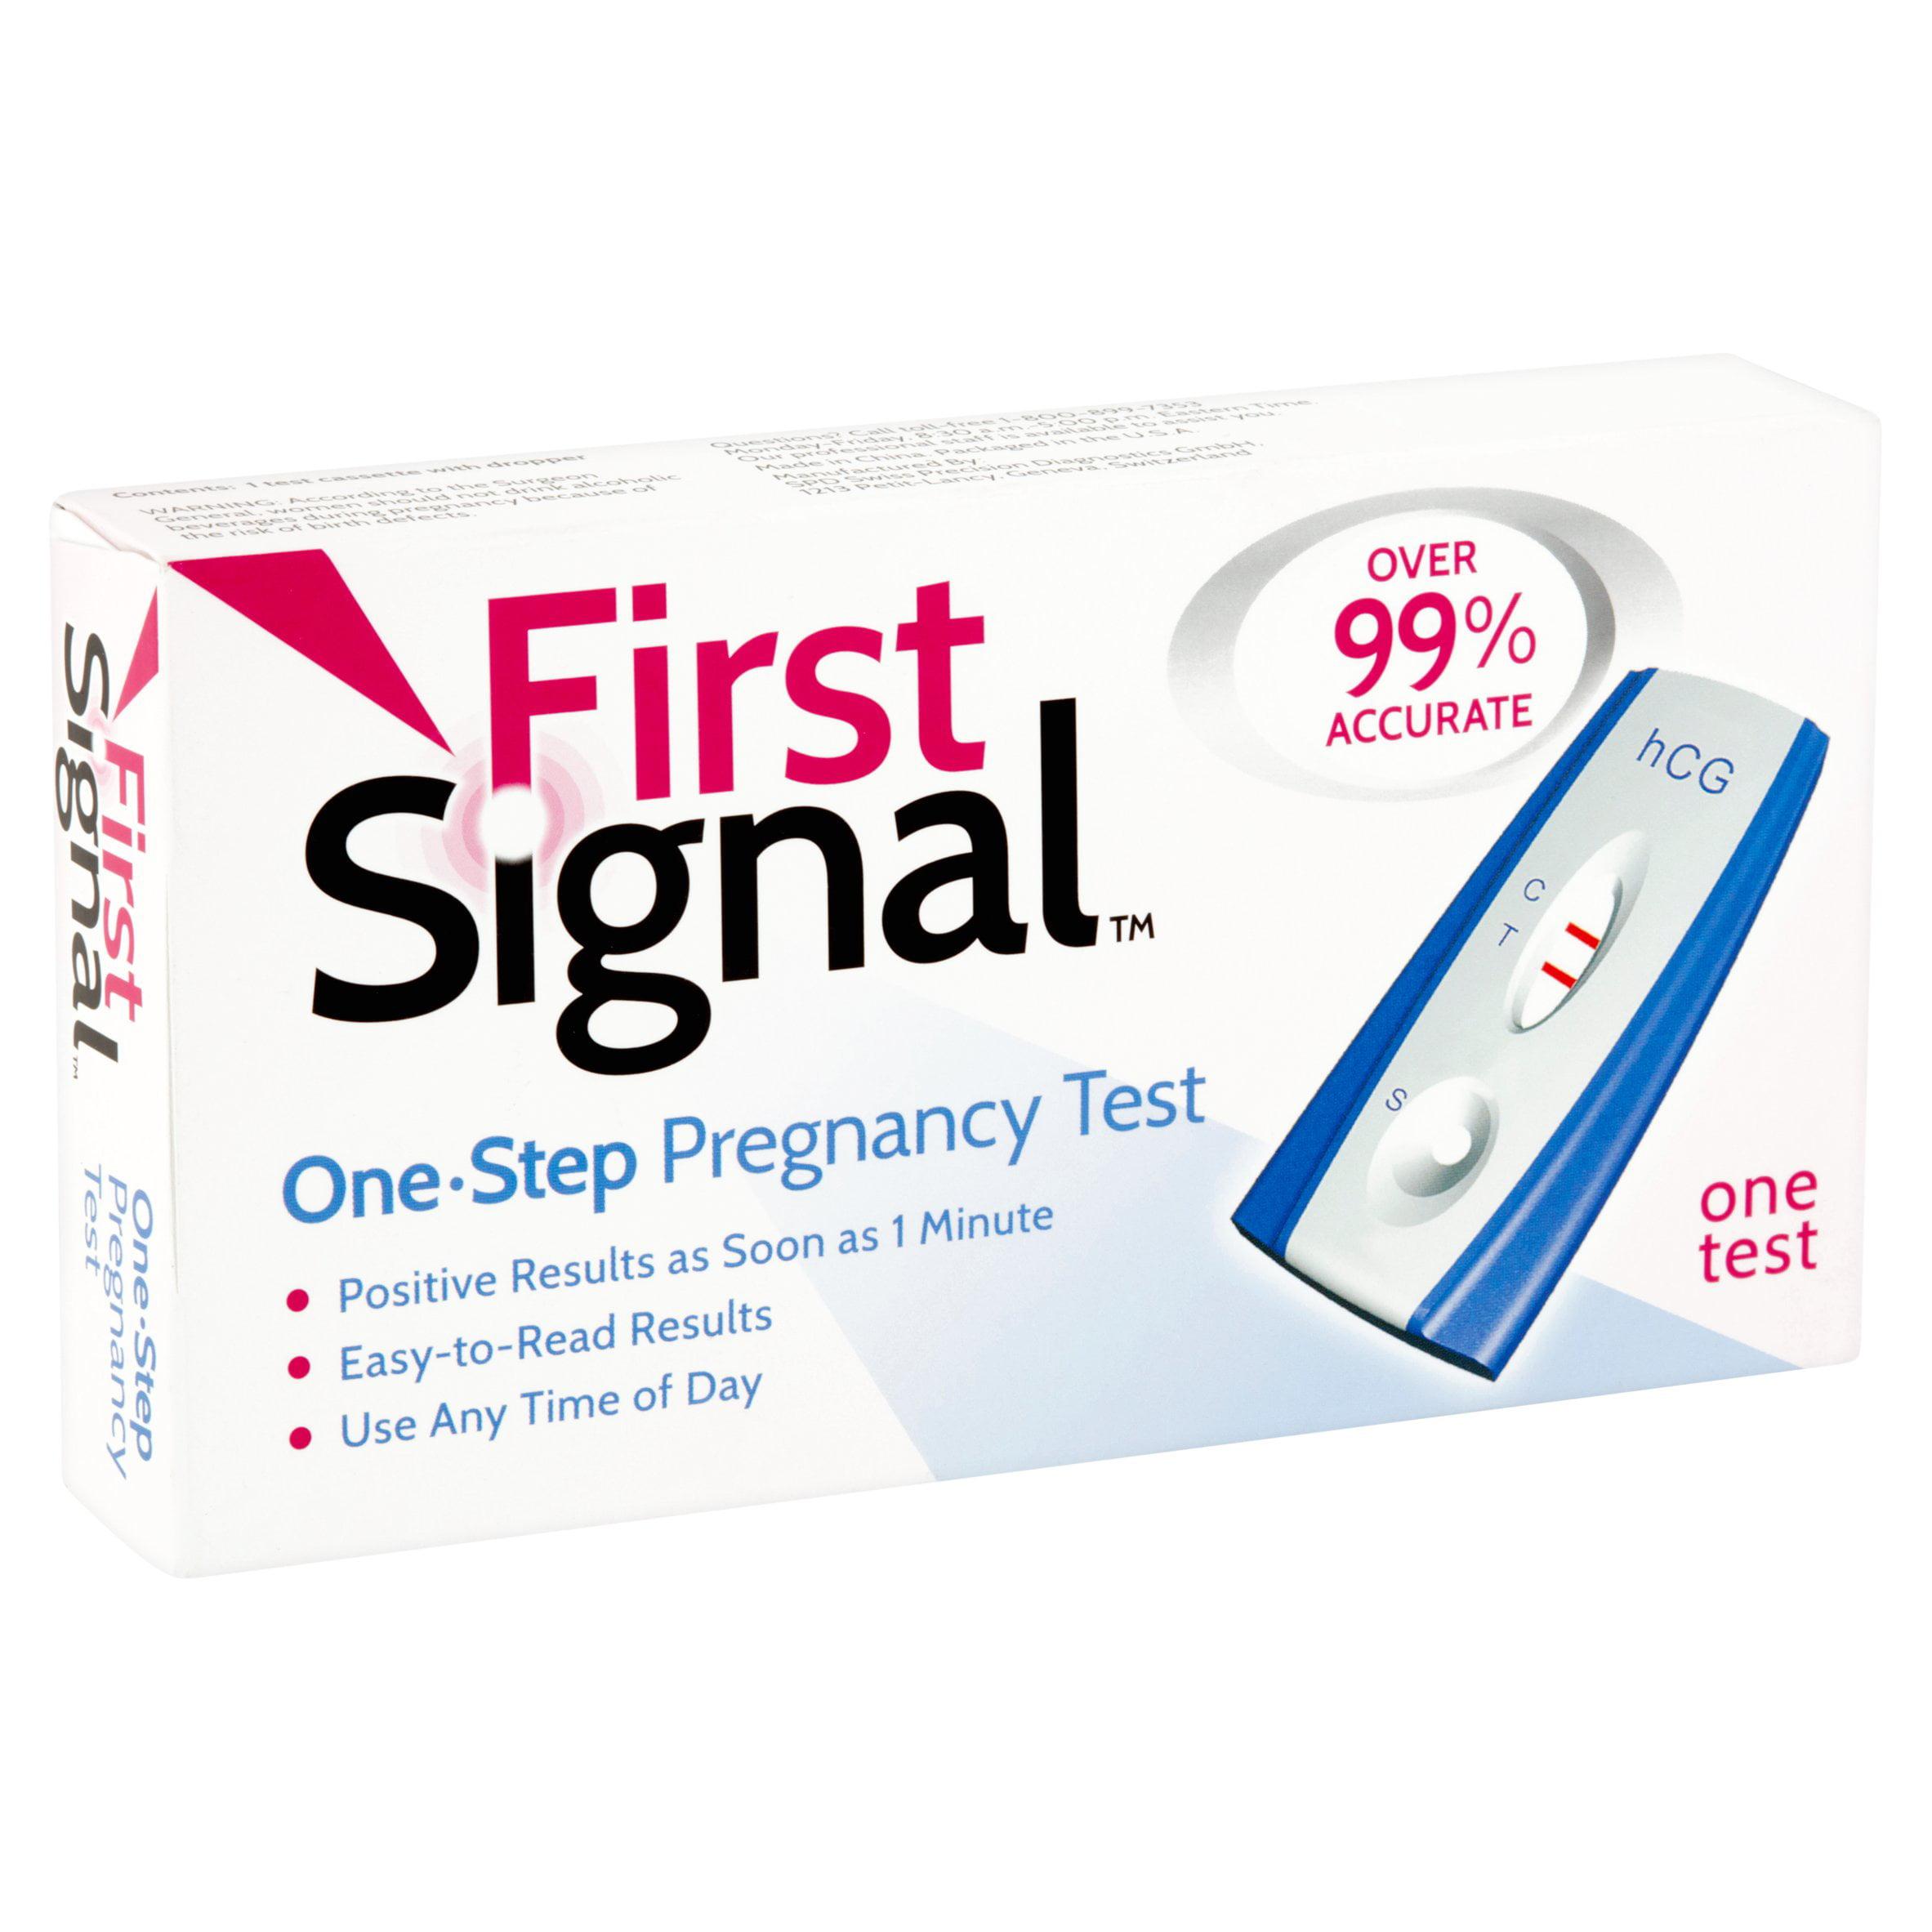 First Signal One-Step Pregnancy Test - Walmart com